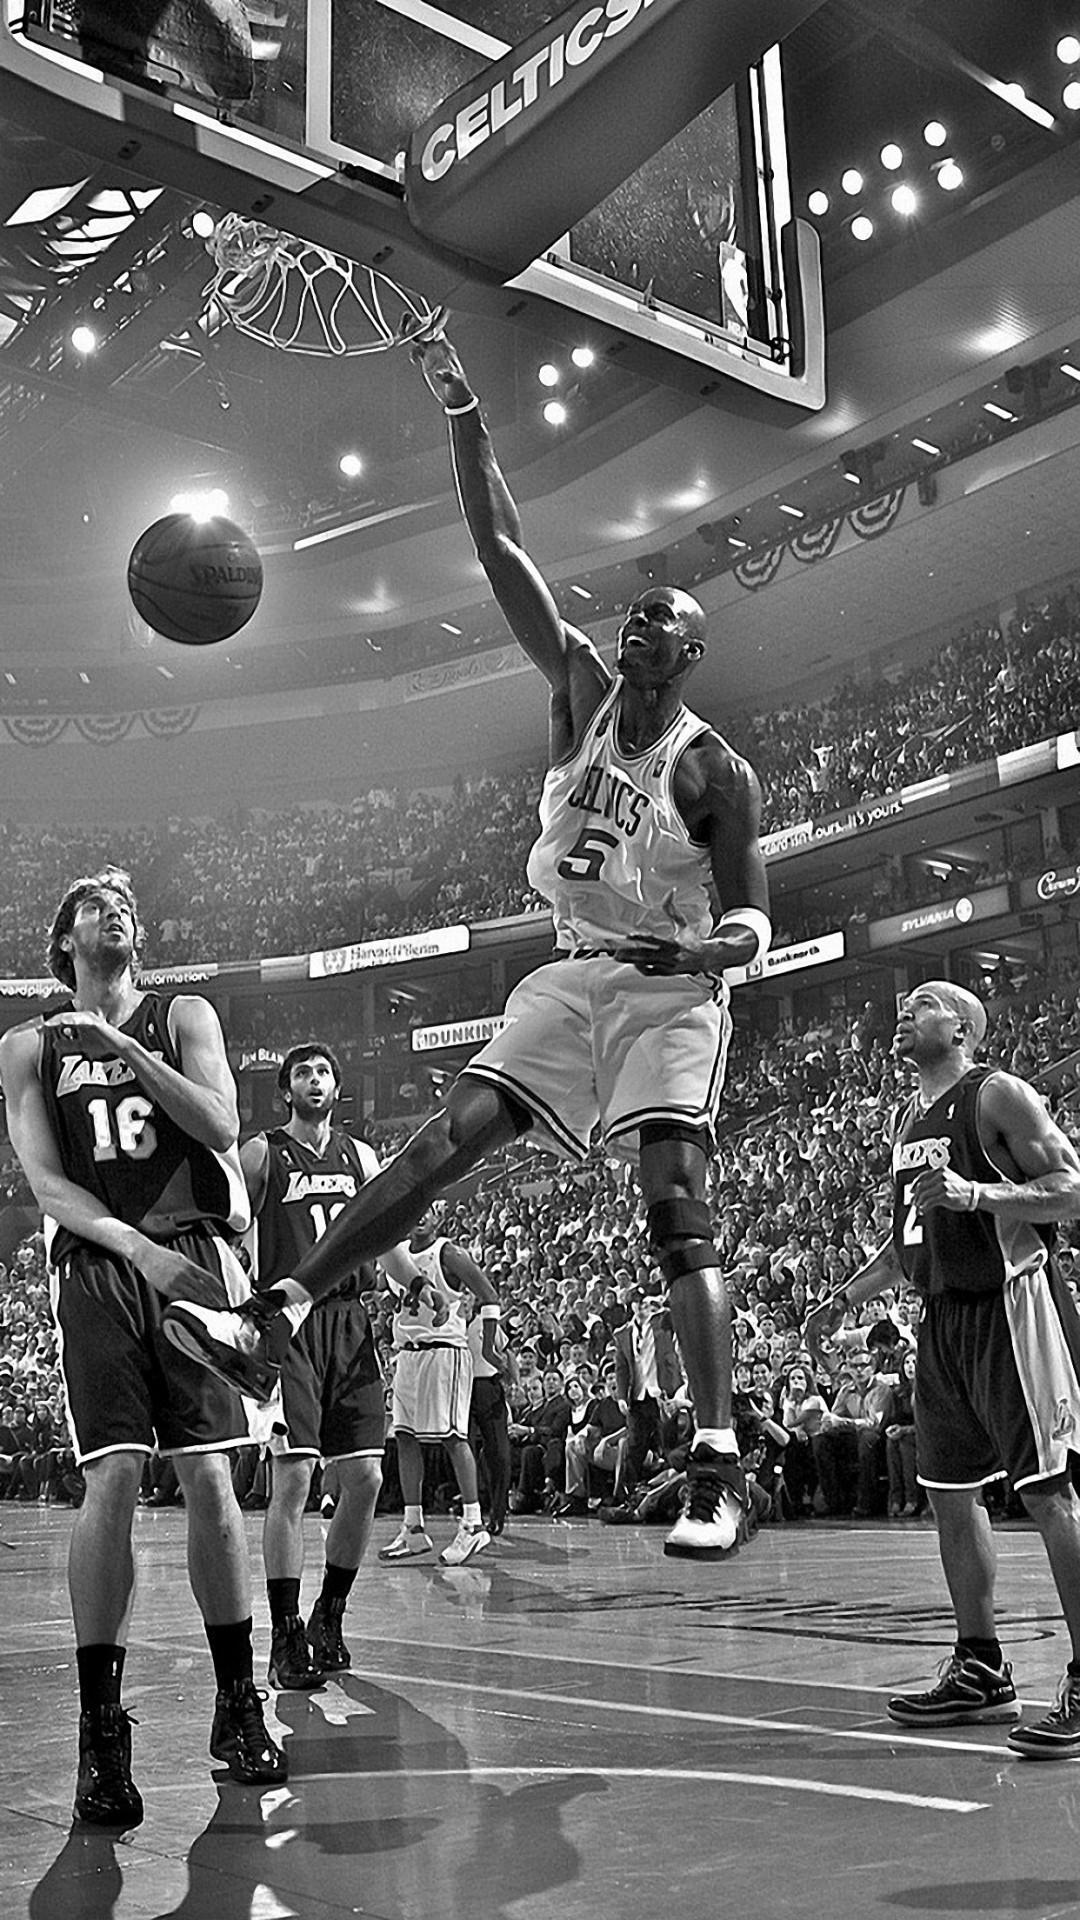 Cool 3d Wallpaper Hd Basketball 68 Images